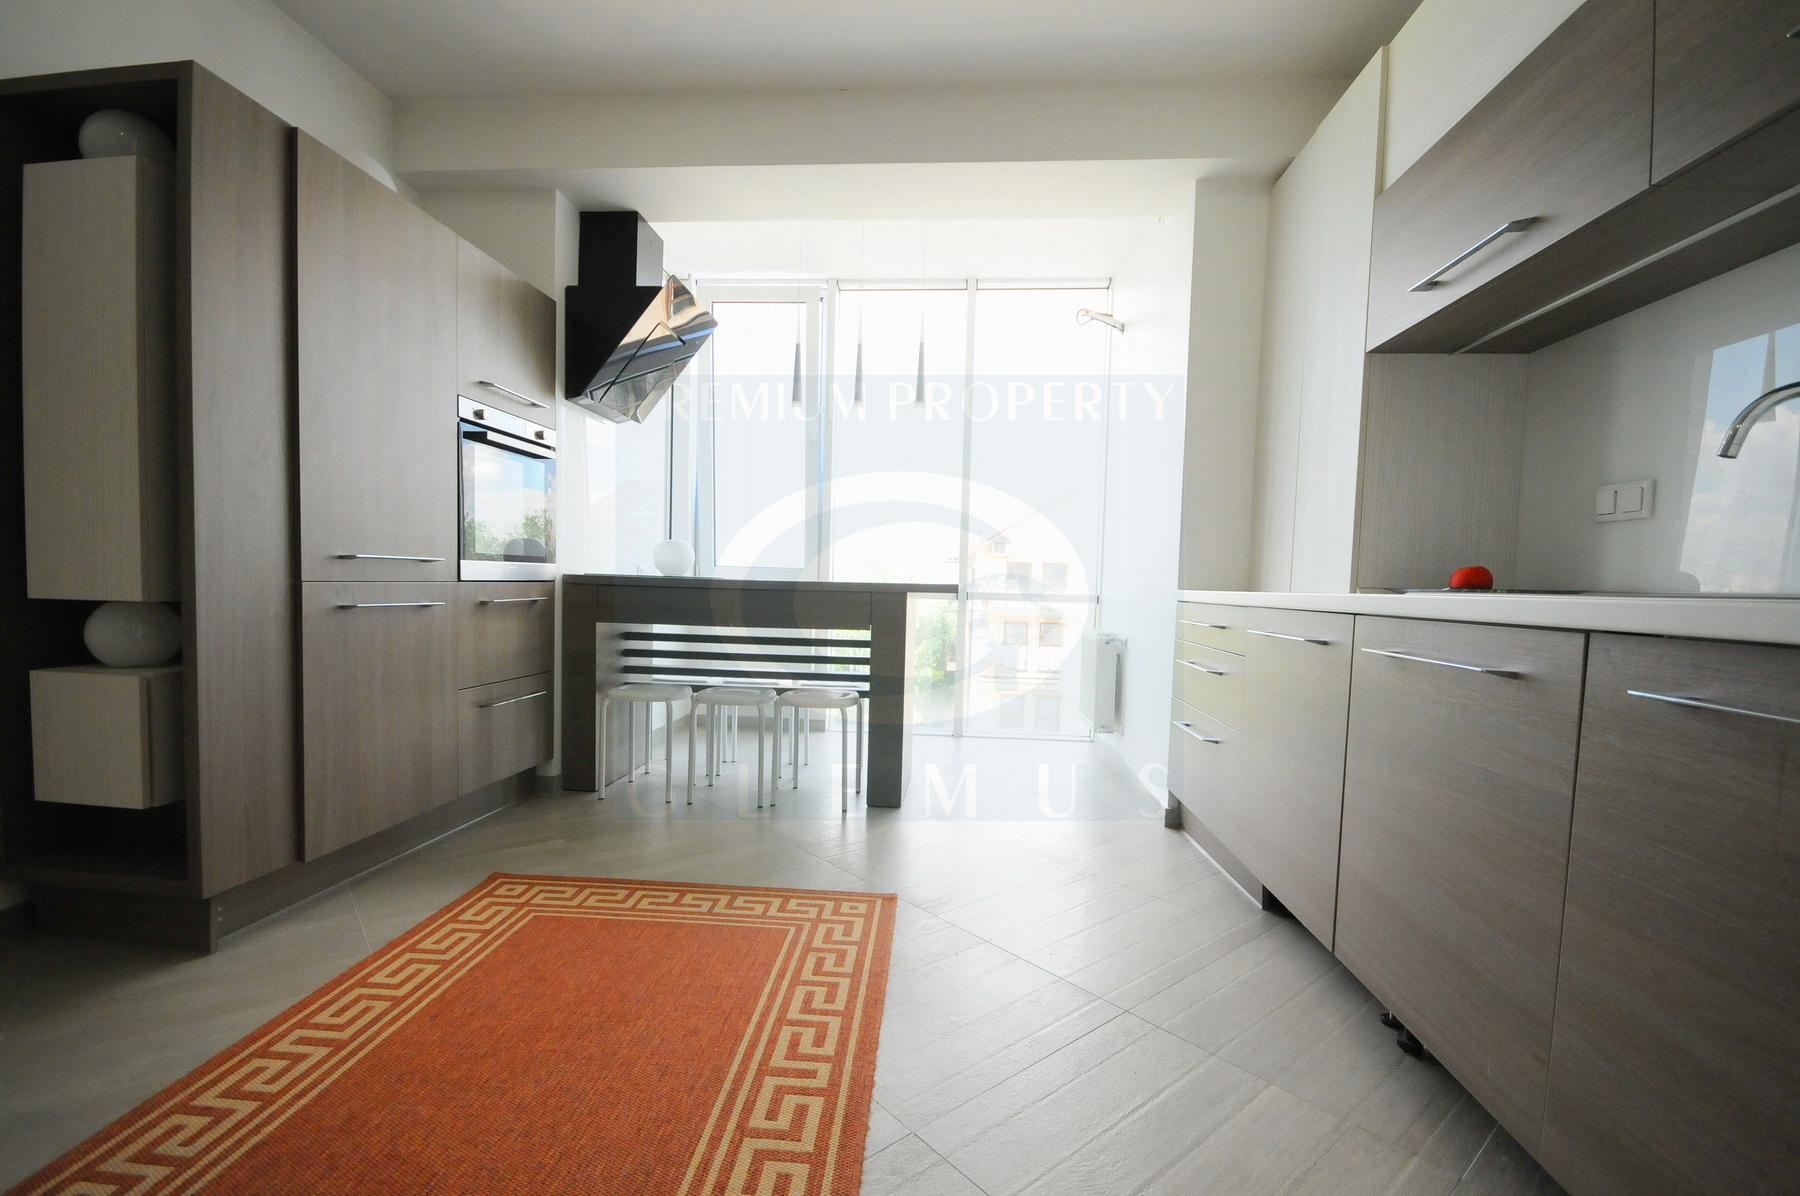 83, Bernardazzi street